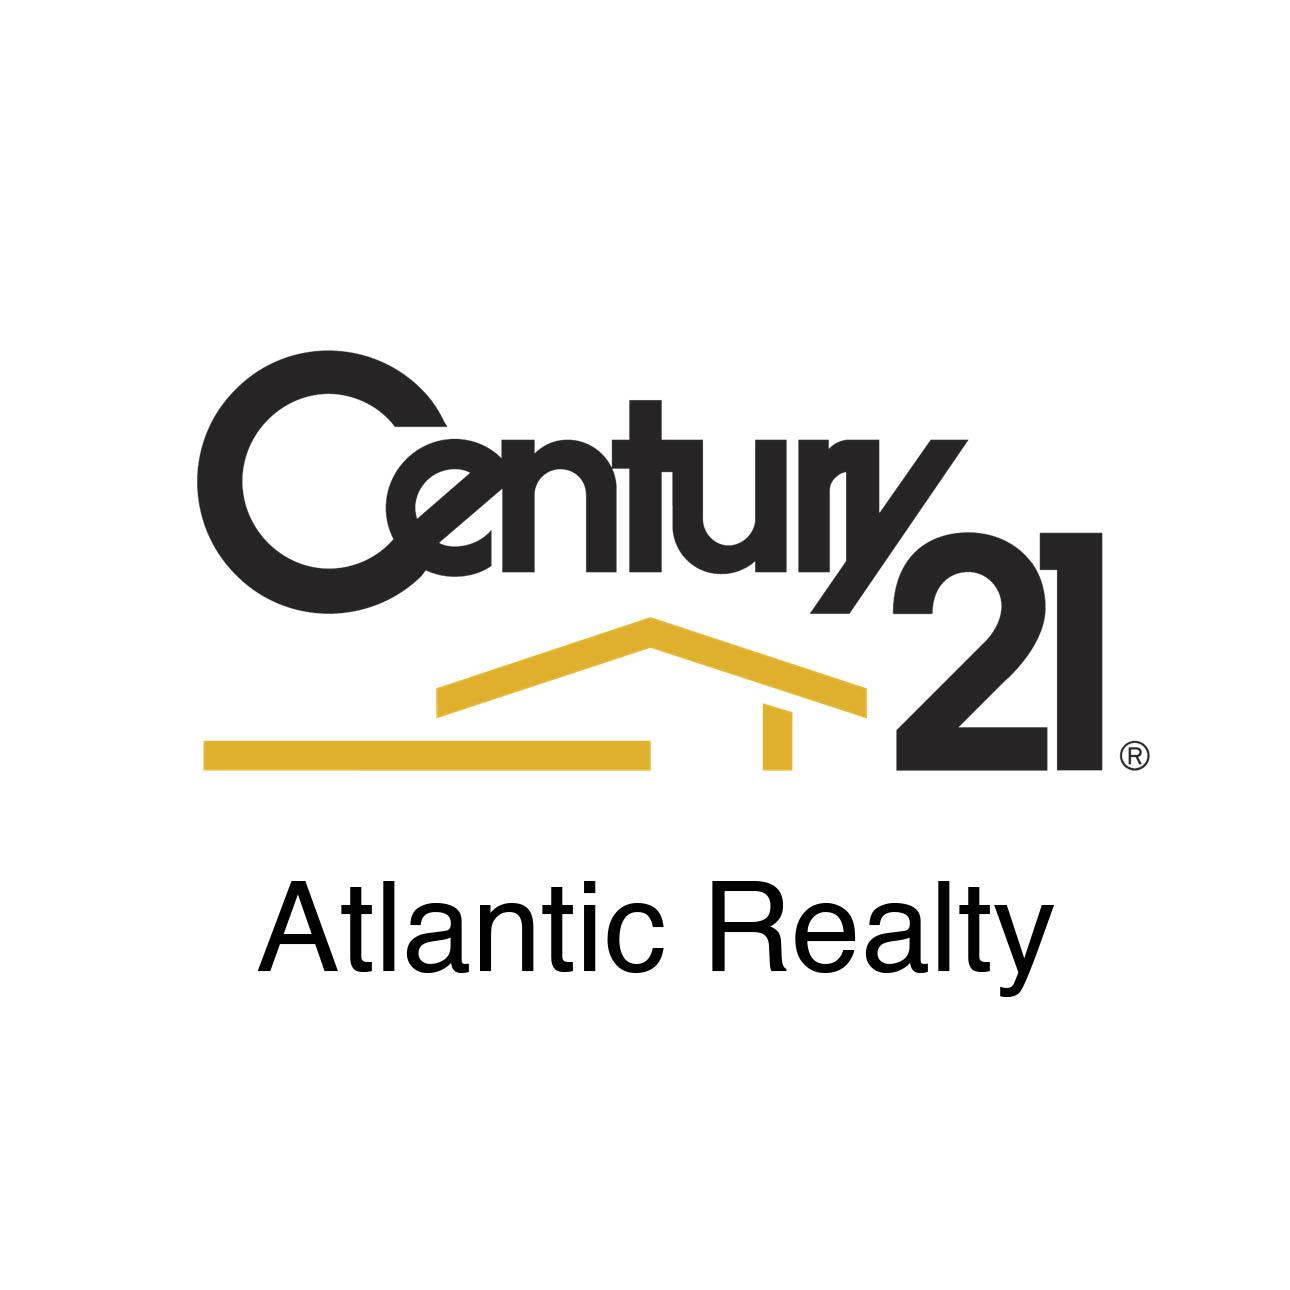 Century 21 Atlantic Realty